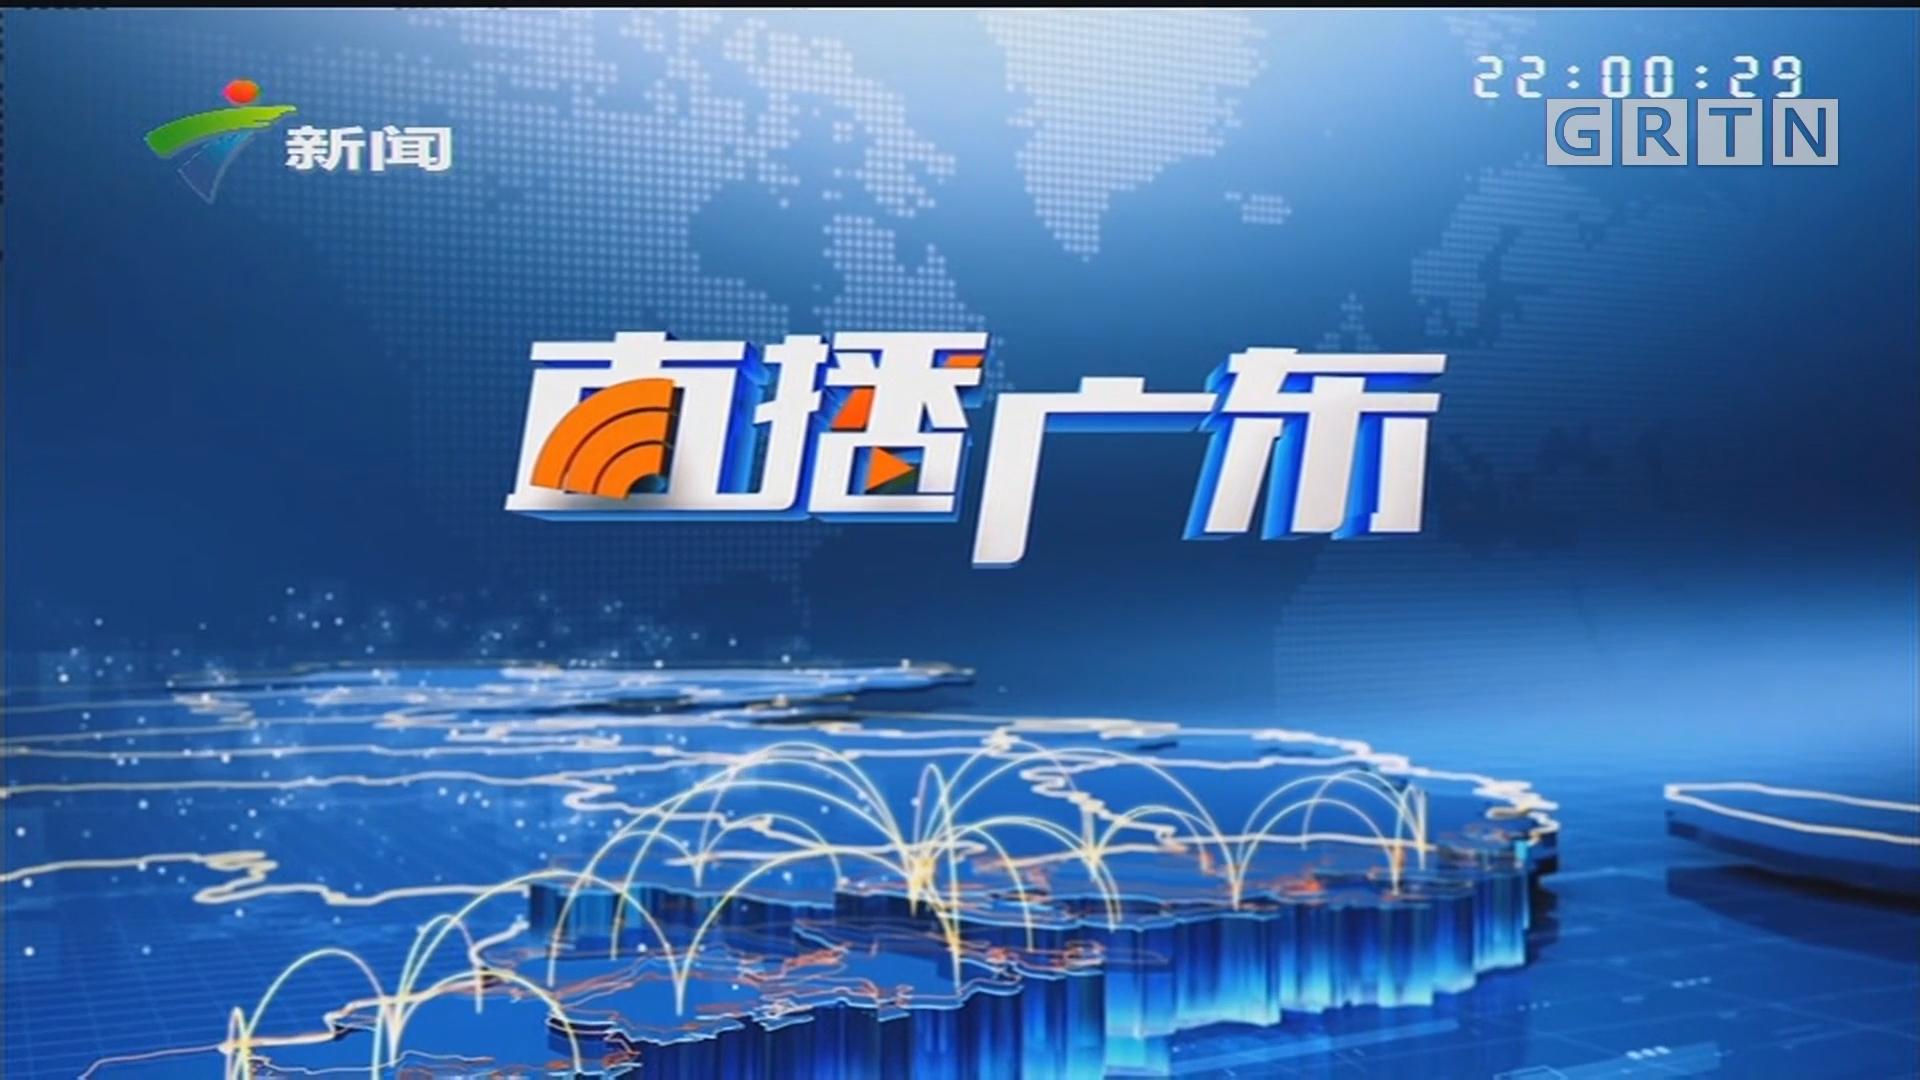 [HD][2019-09-07]直播广东:广州采取十大措施保供稳价 投放1600吨储备冻猪肉